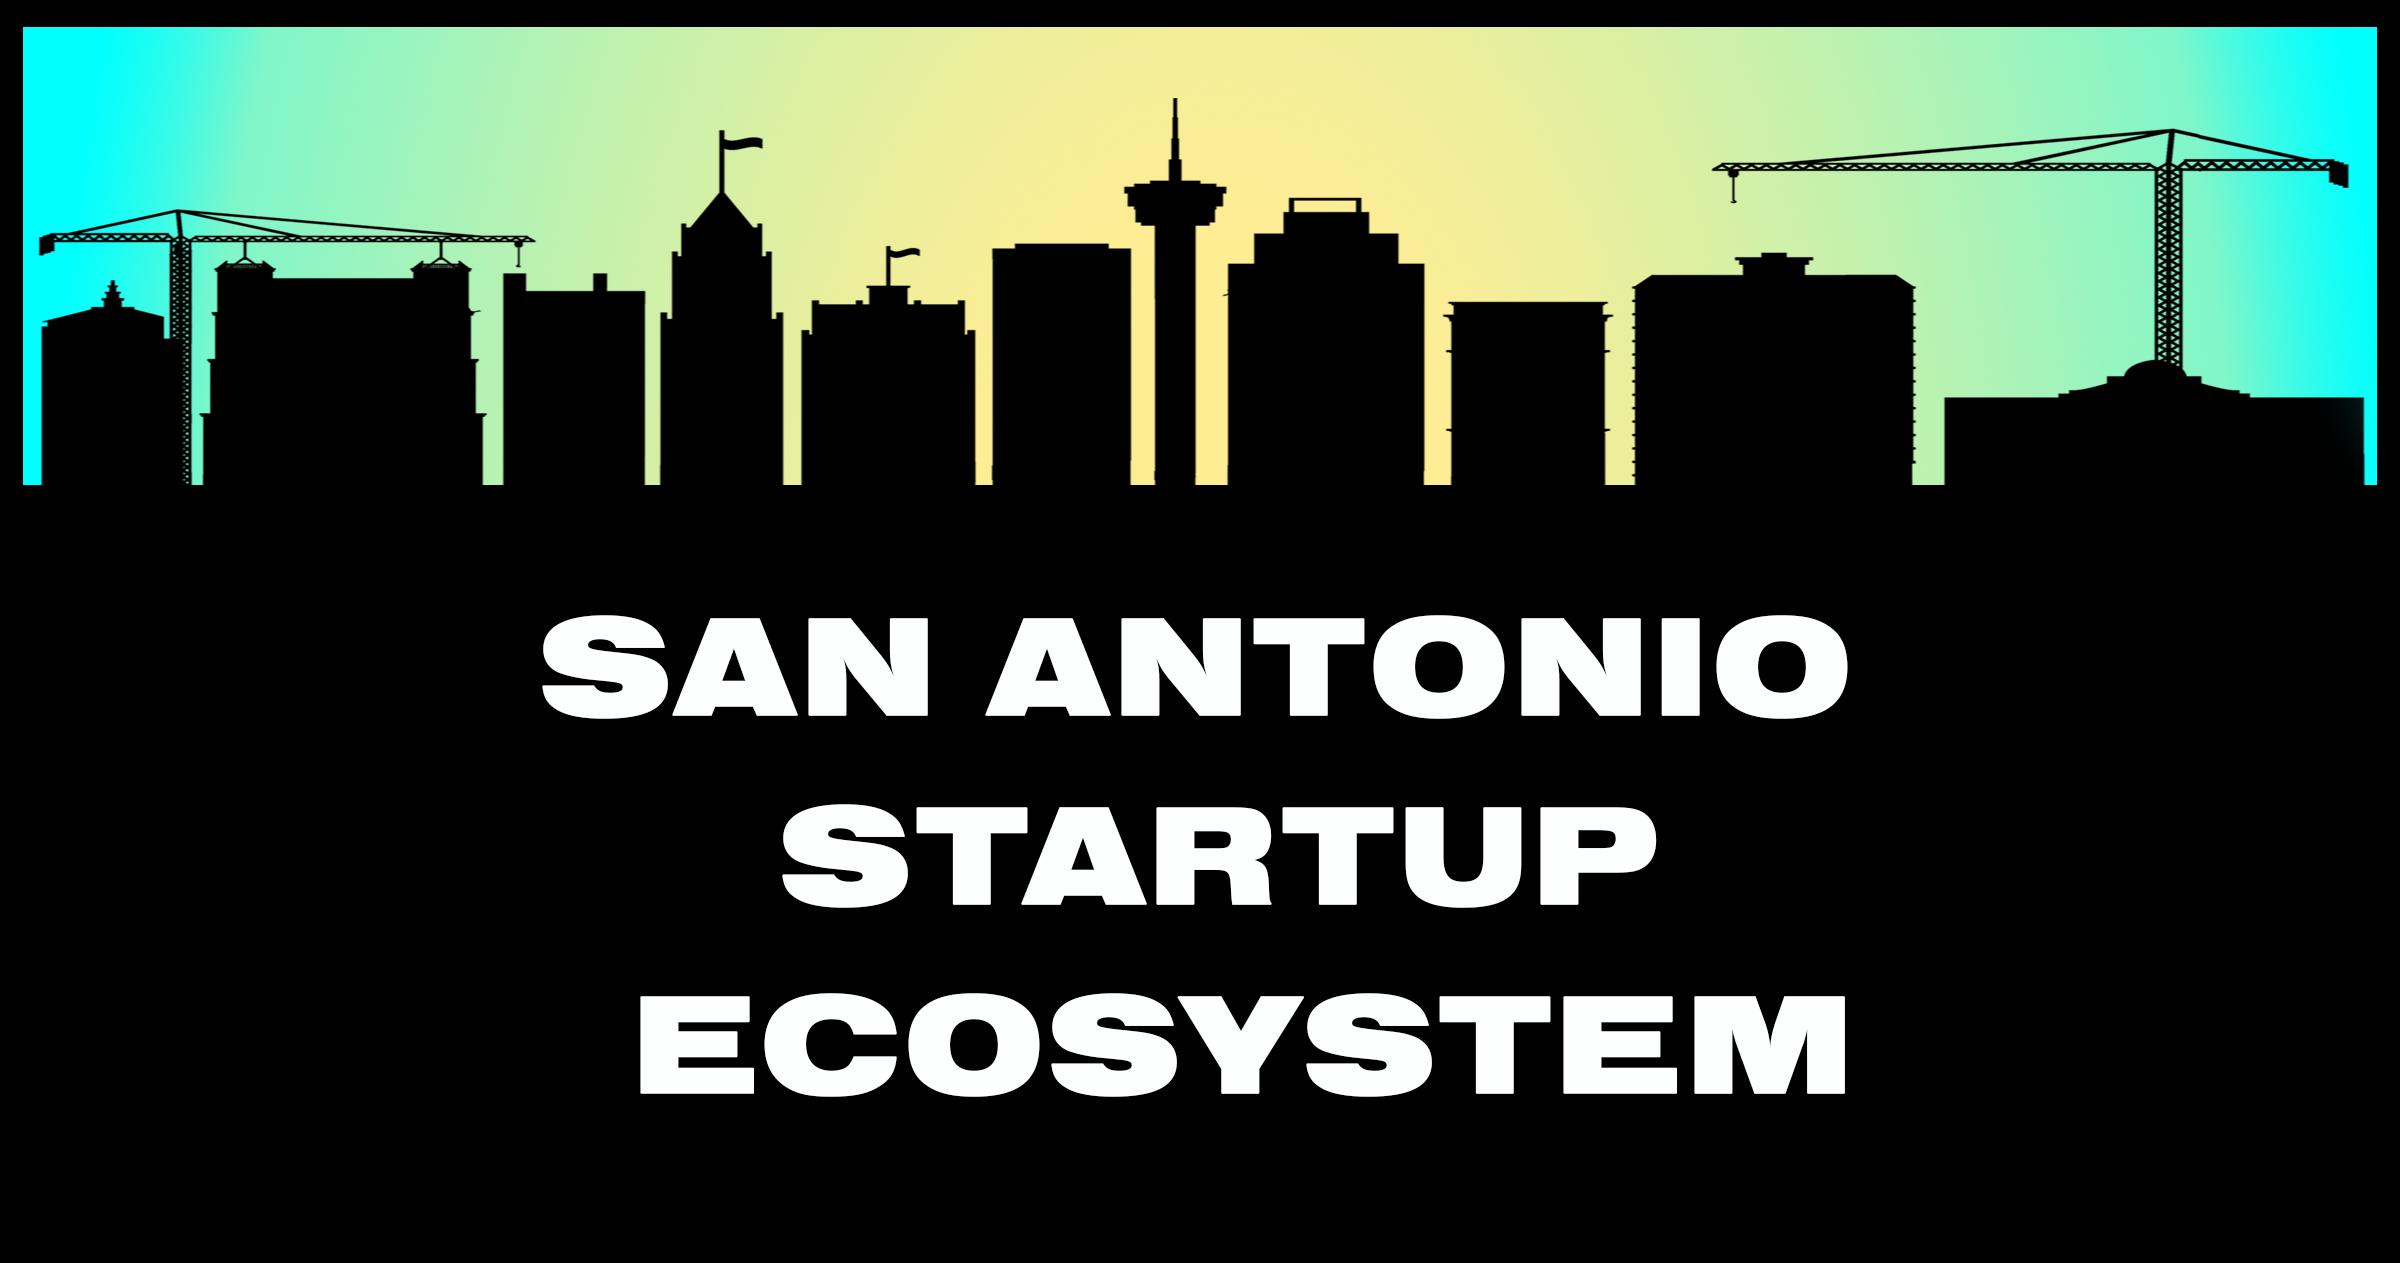 What Does San Antonio's Startup Ecosystem Need?